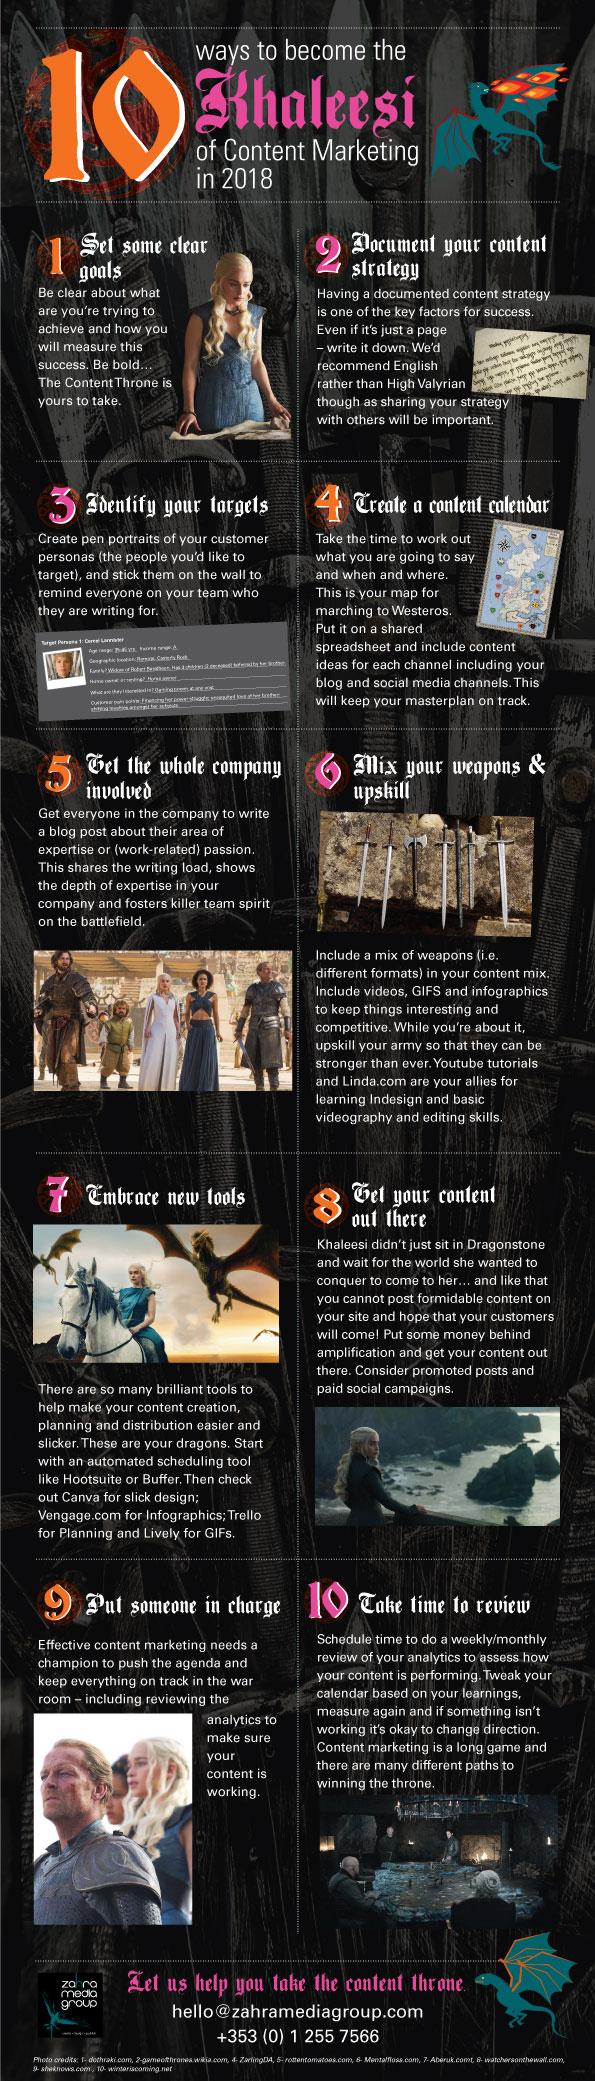 Khaleesi-of-Content-Marketing